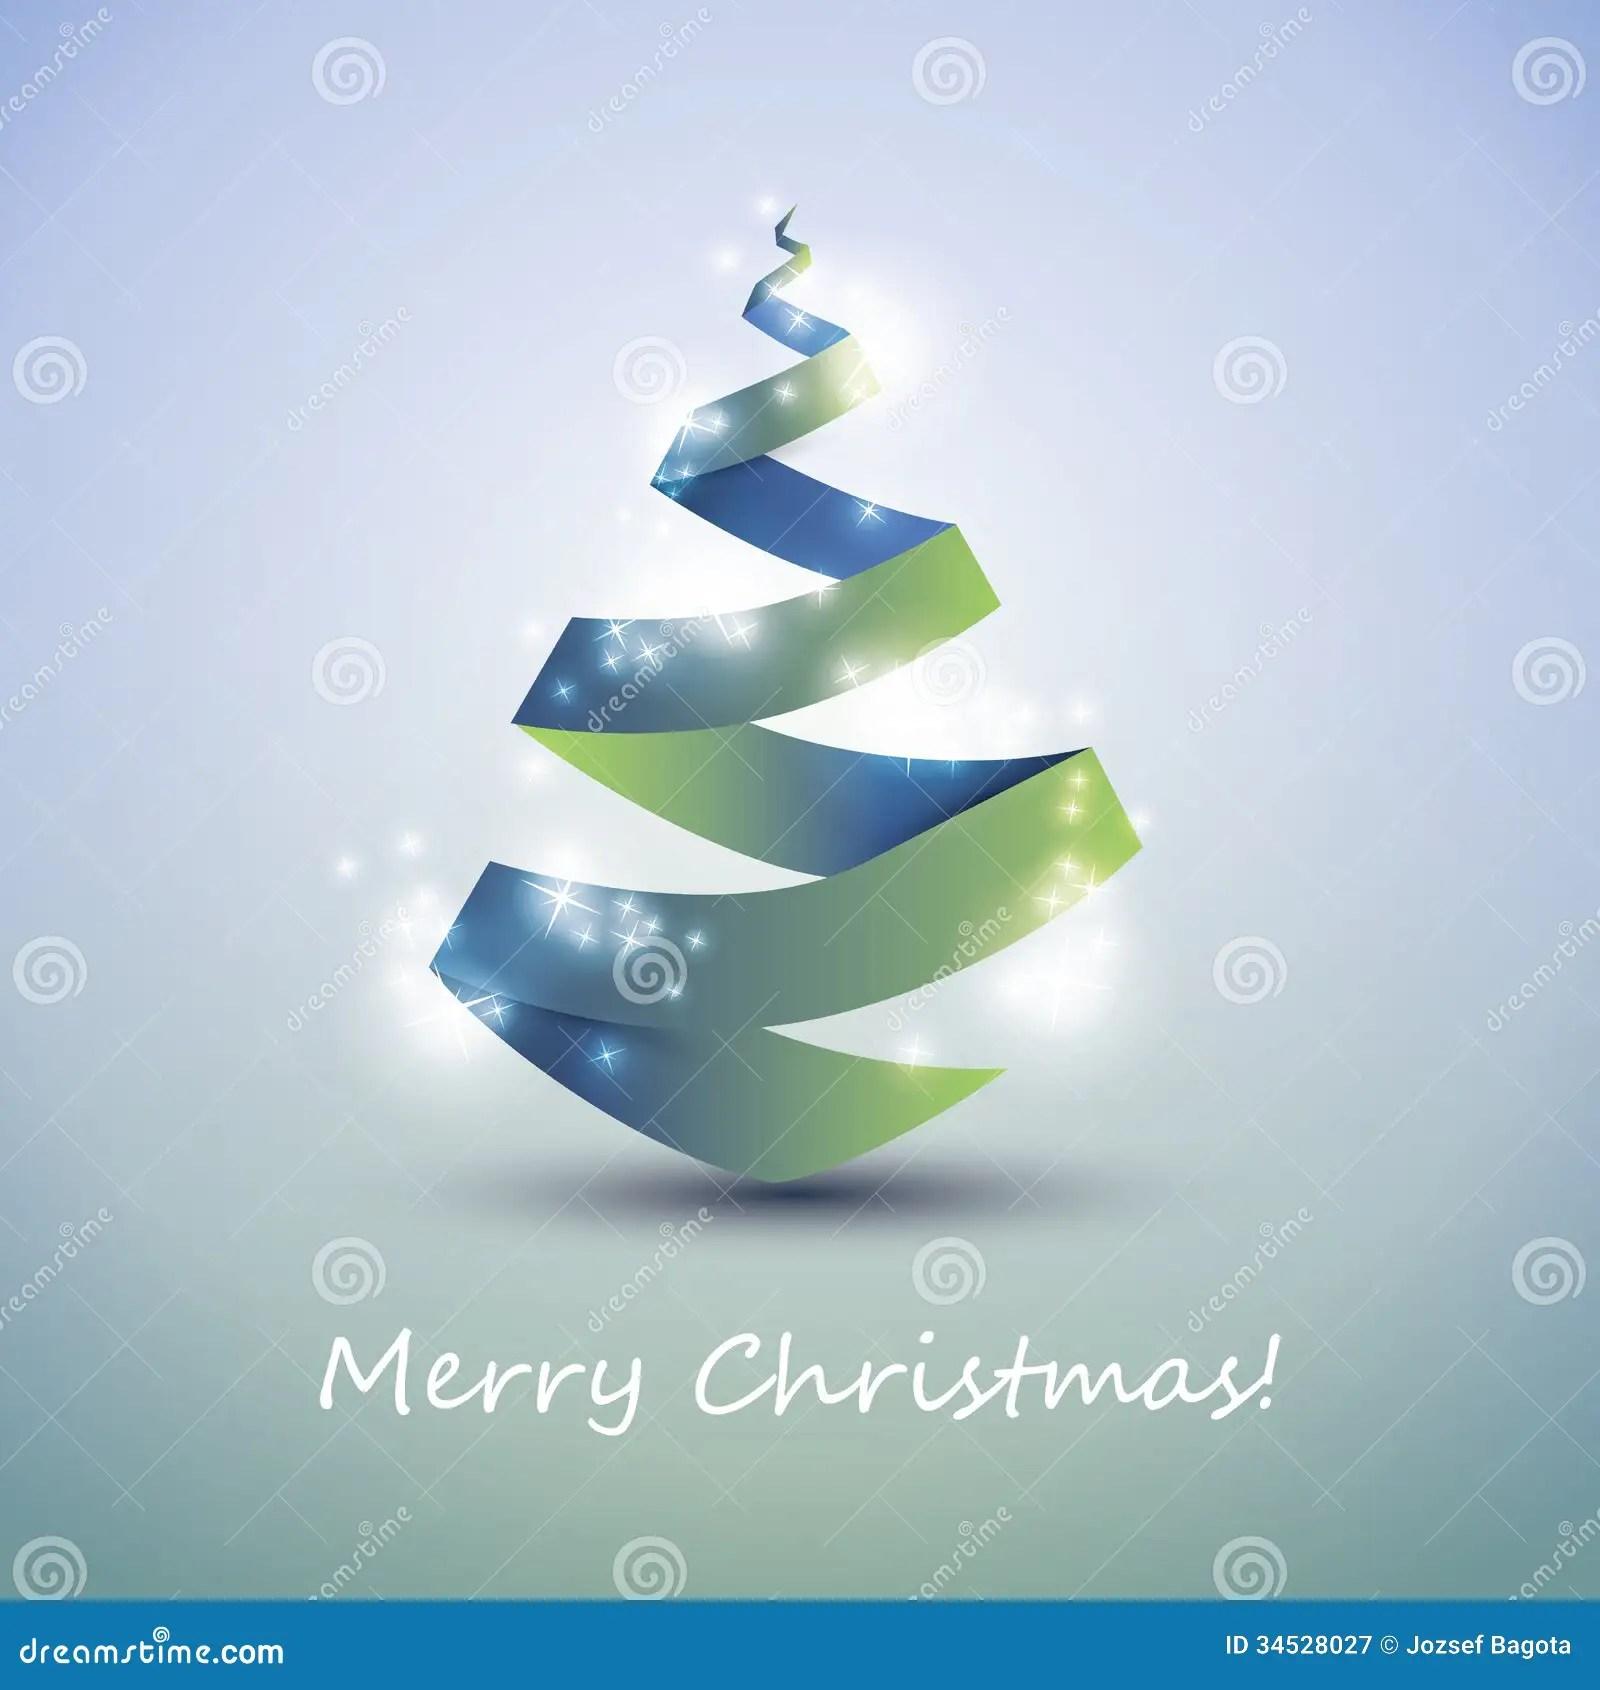 Christmas Card Royalty Free Stock Photography Image